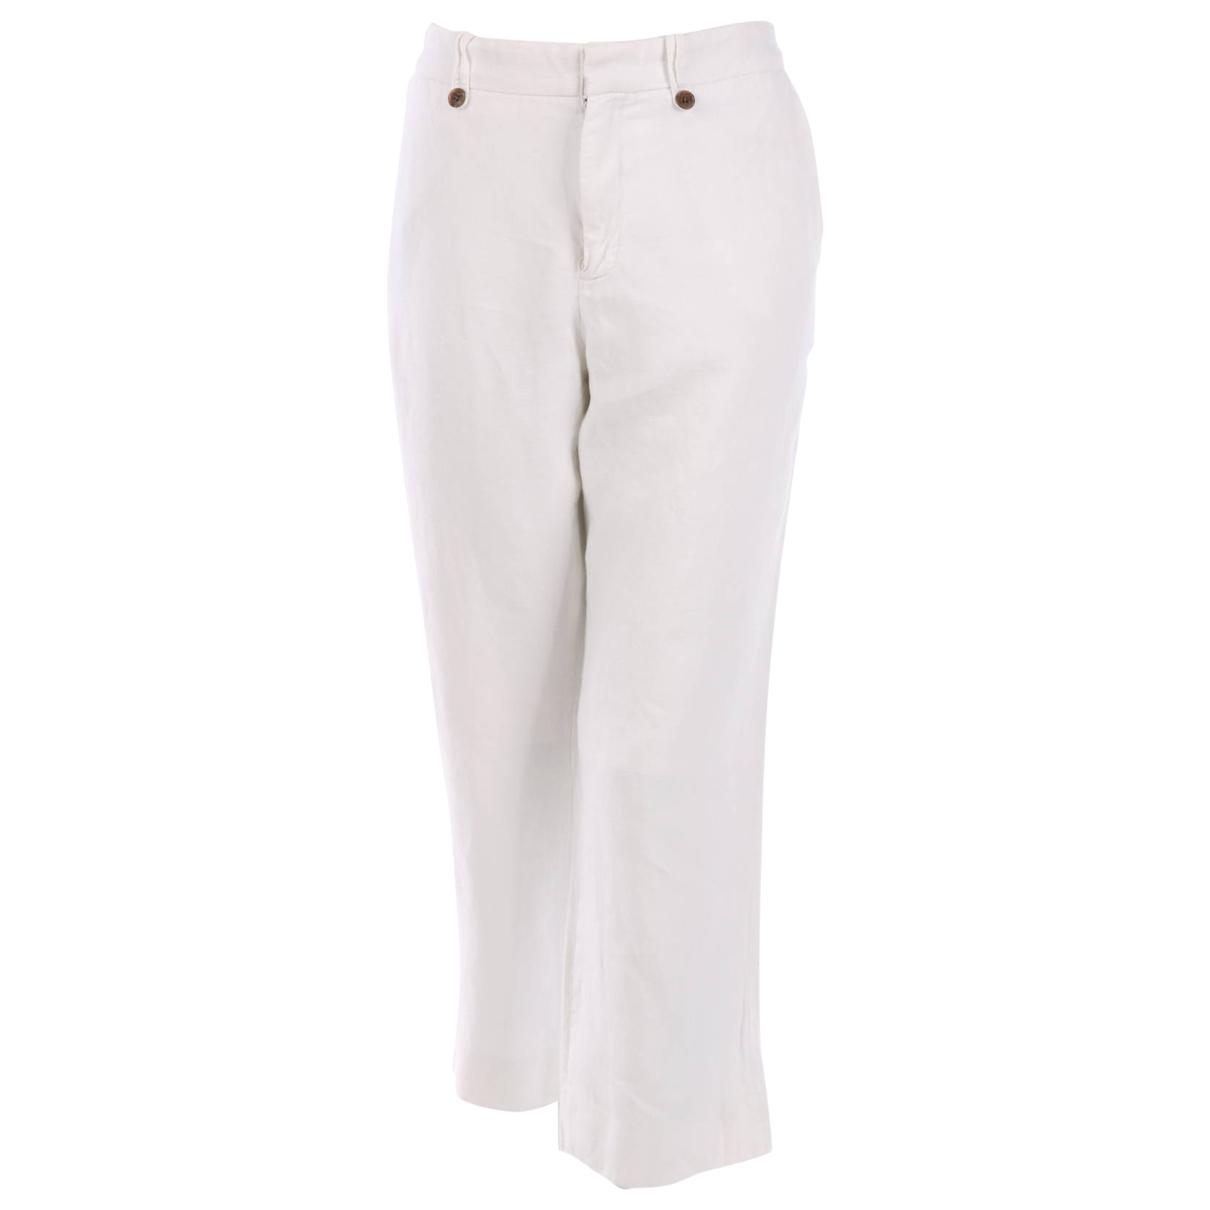 Emporio Armani \N White Linen Trousers for Women XXL International